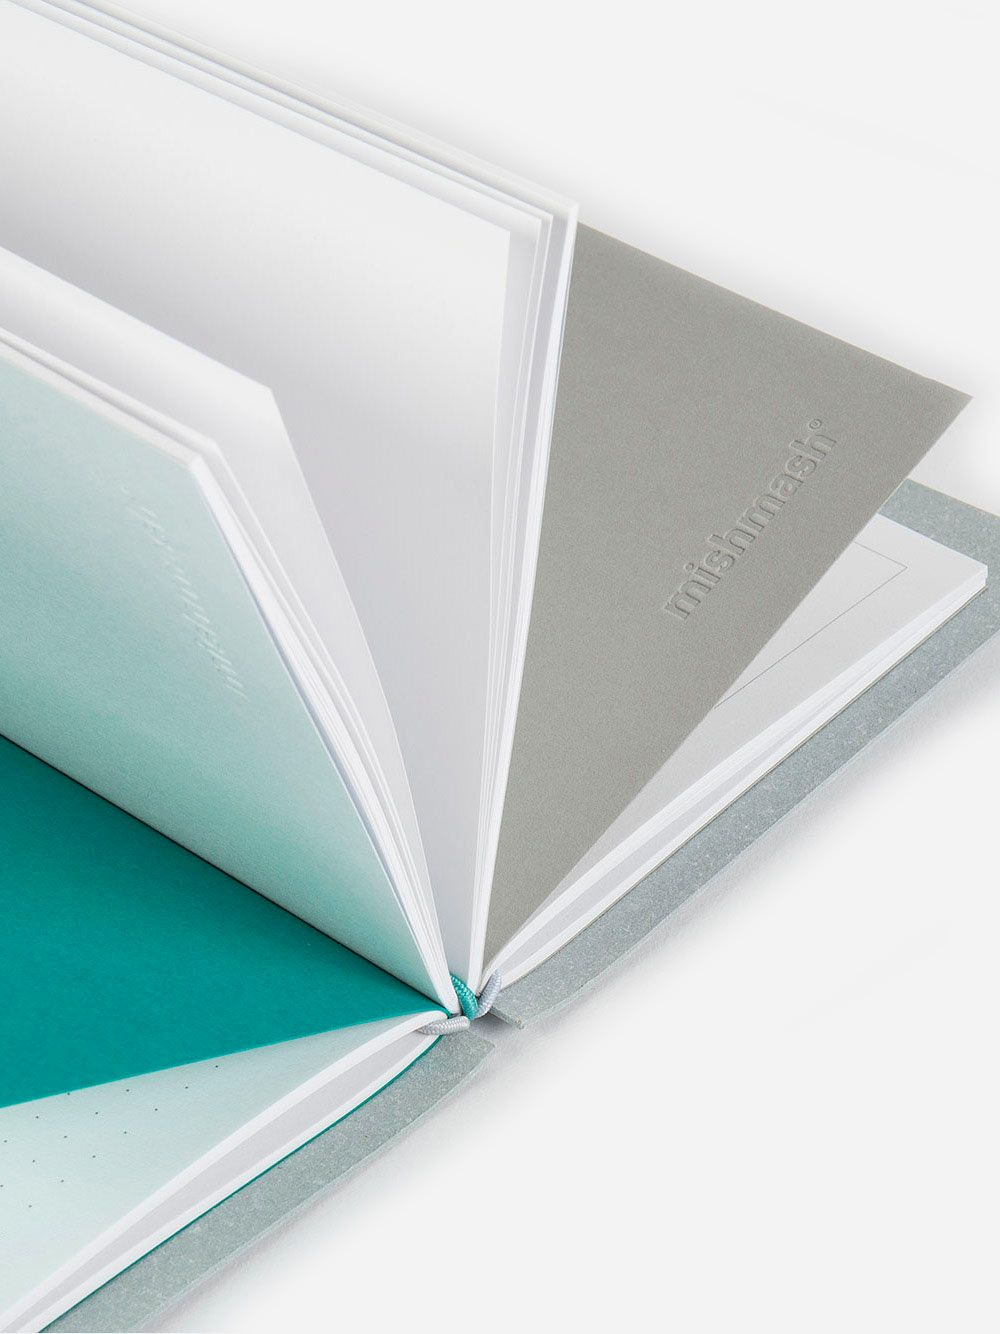 Creative Log Sky Grey Notebook | Mishmash